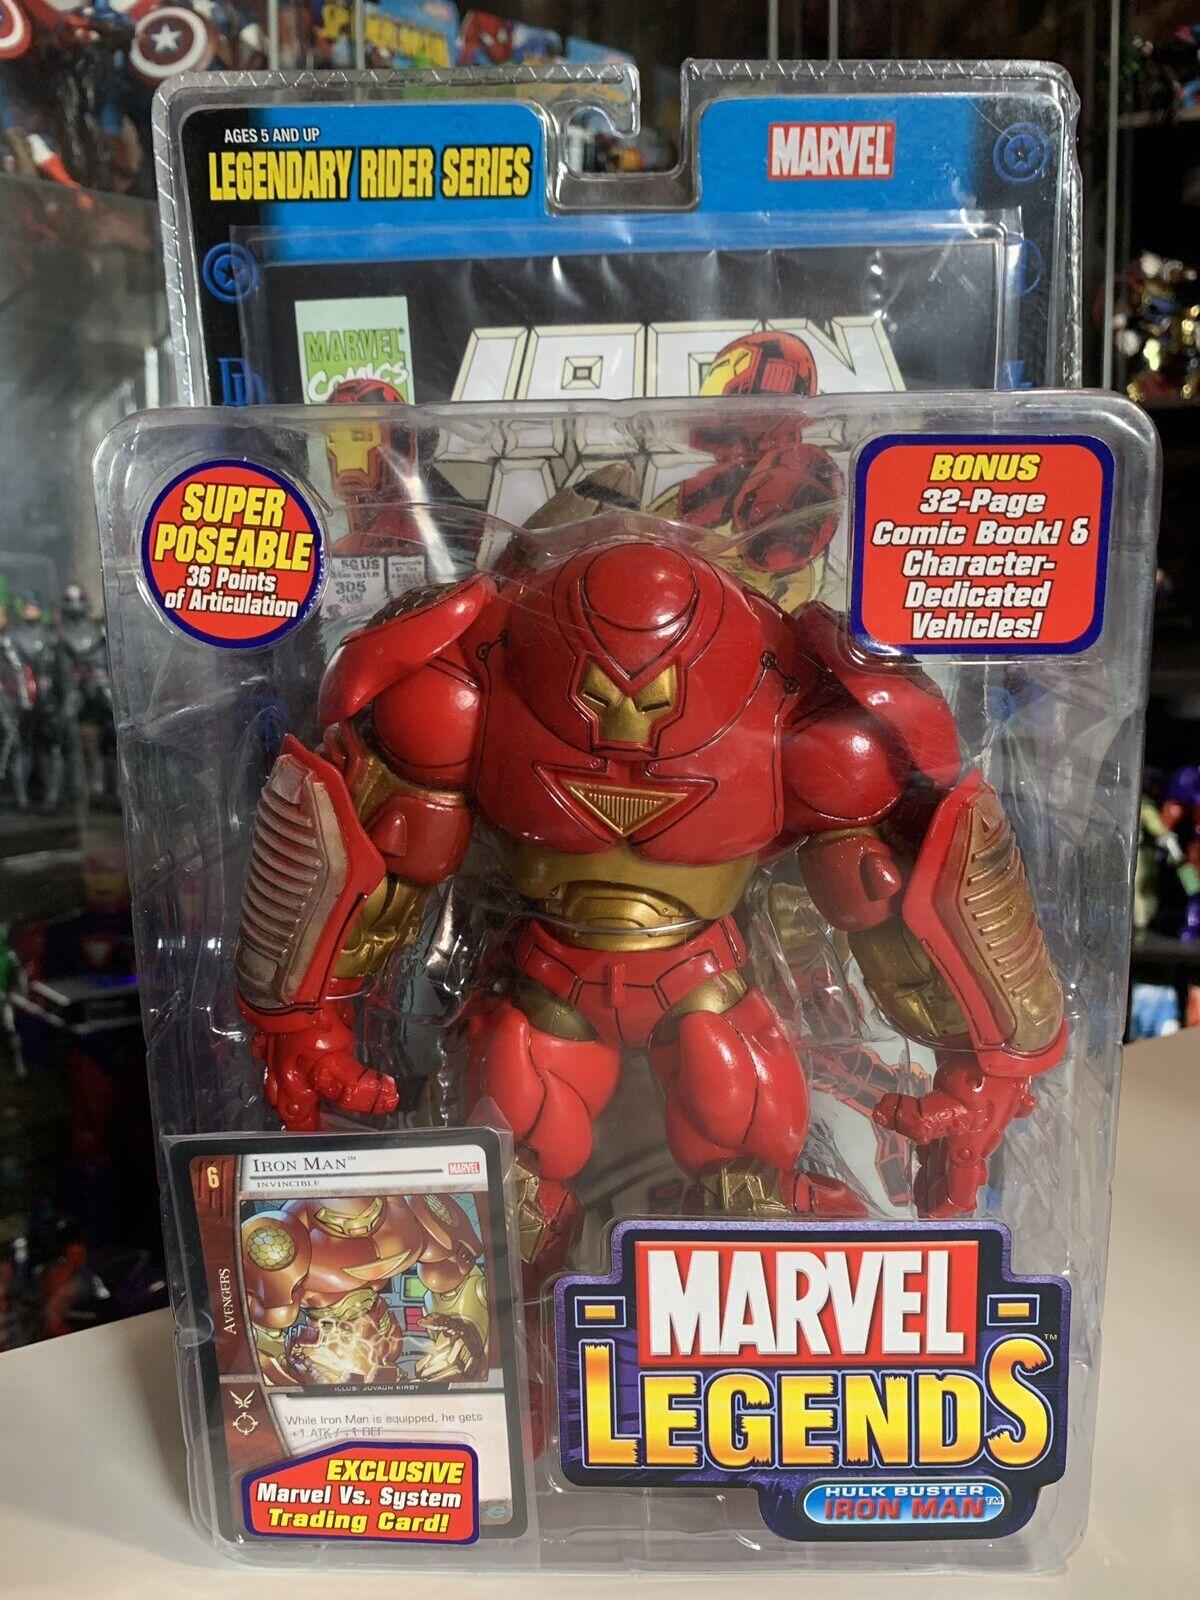 Marvel legends hulk buster iron  homme LEGENDARY RIDER SERIES TOY BIZ  2018 magasin